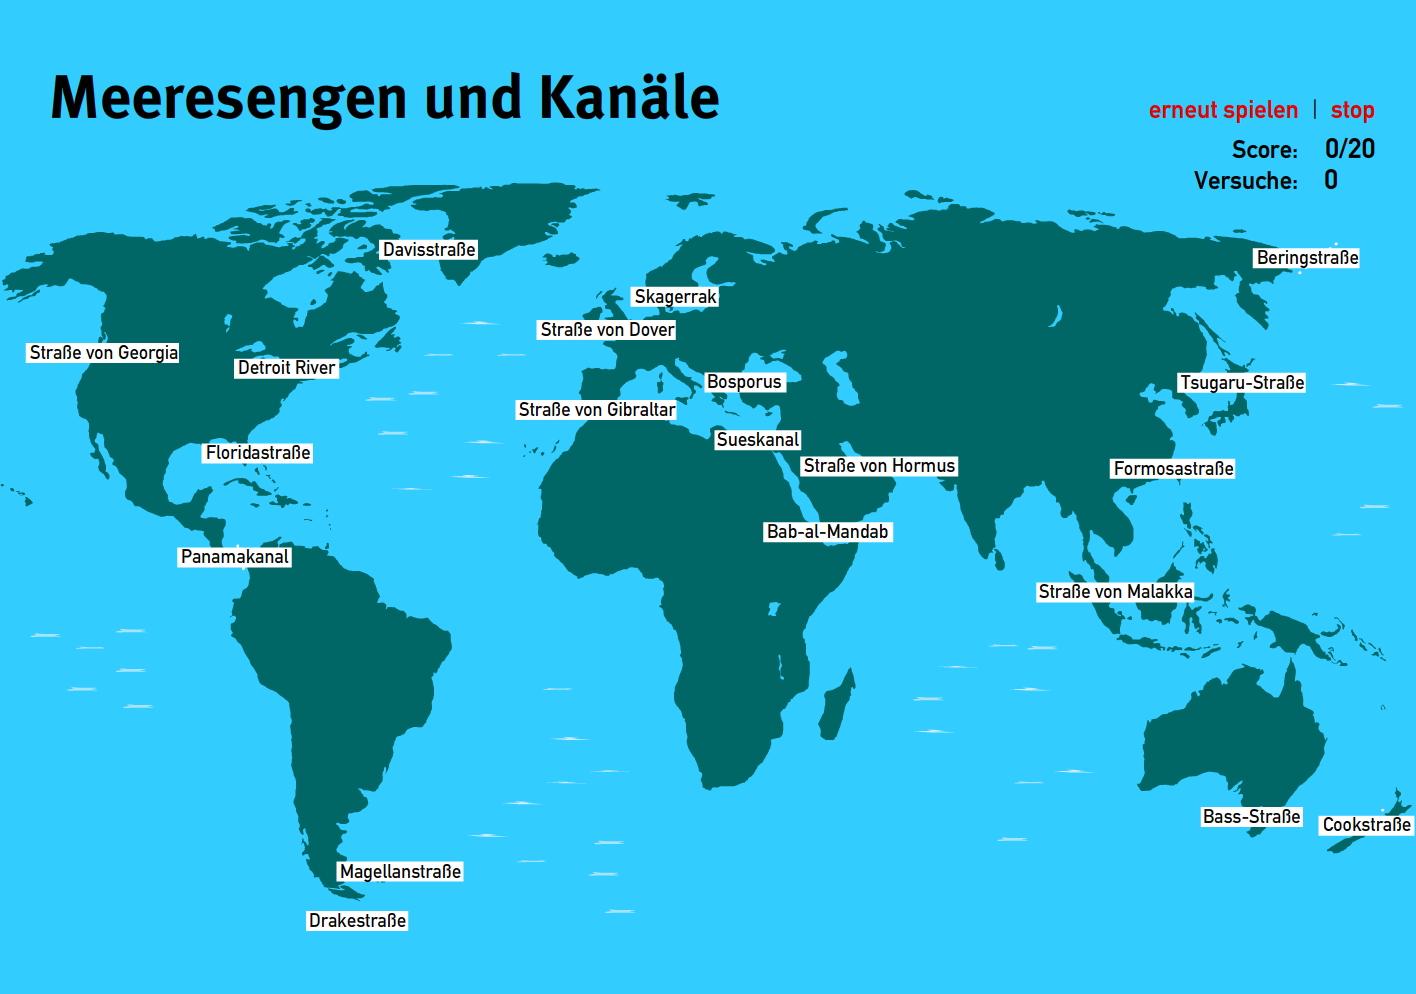 Preview image for LOM object Meeresengen und Kanäle der Welt